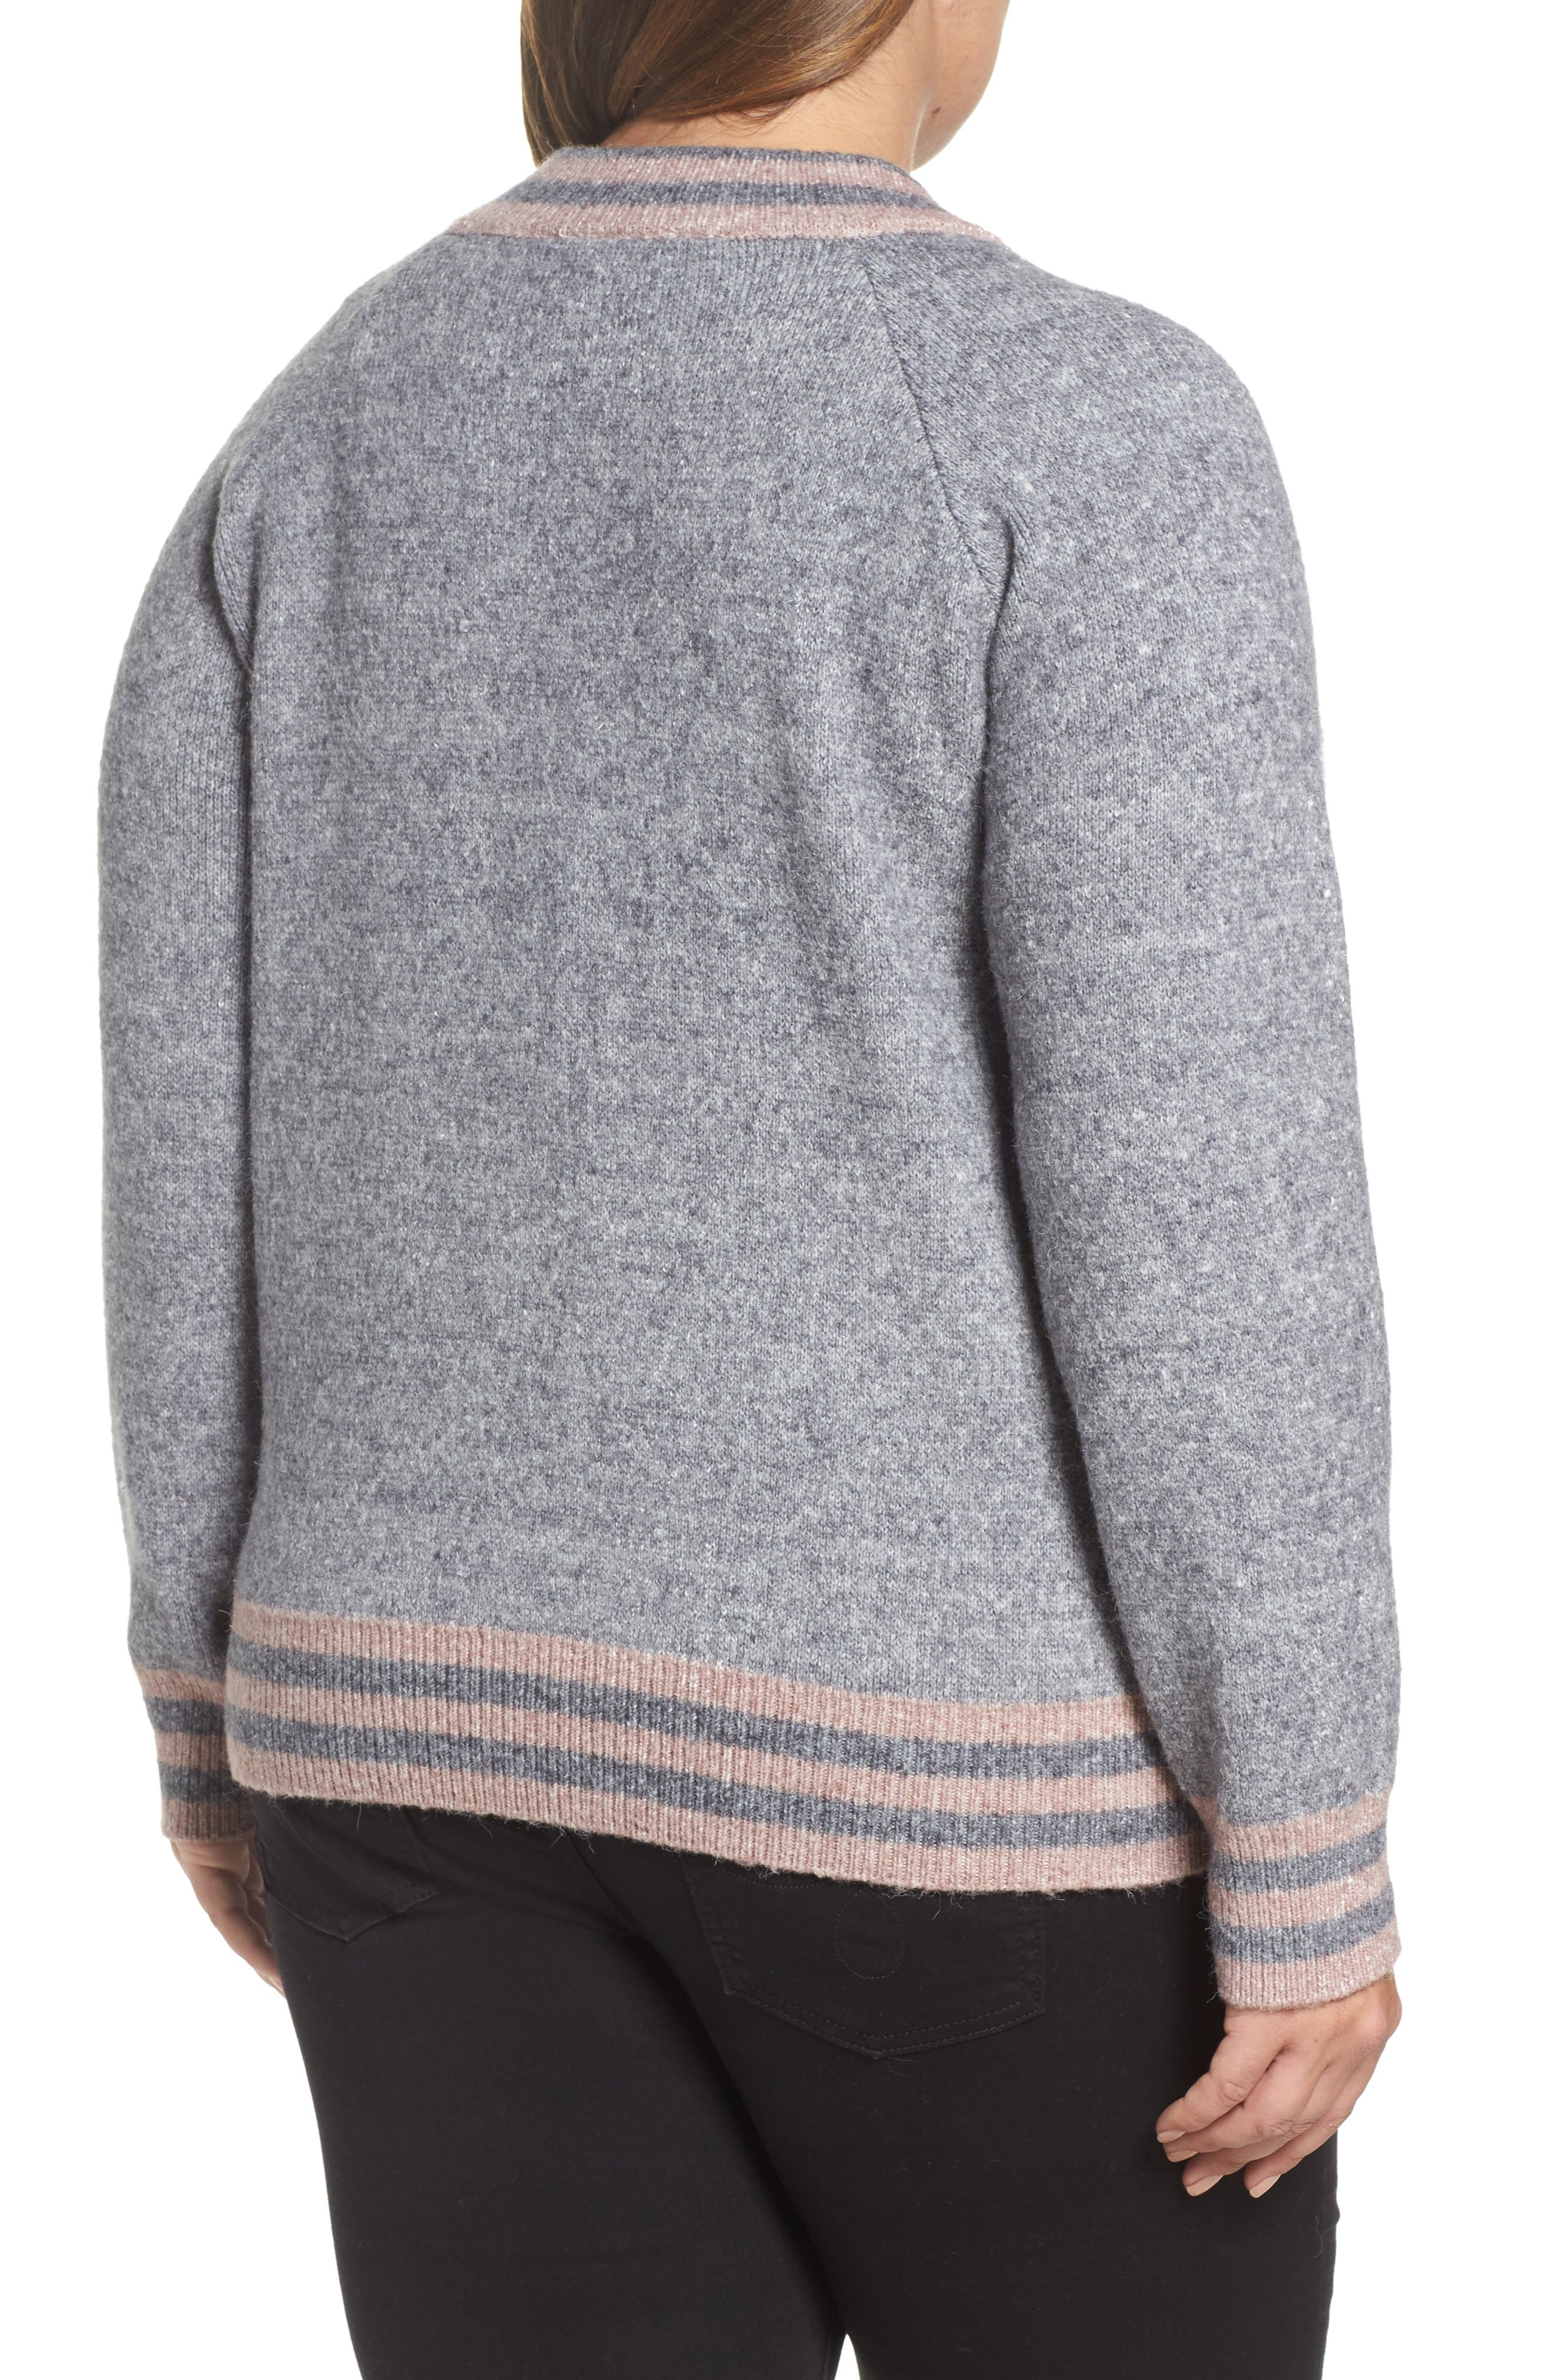 Zanja Embroidered Knit Bomber Jacket,                             Alternate thumbnail 2, color,                             034